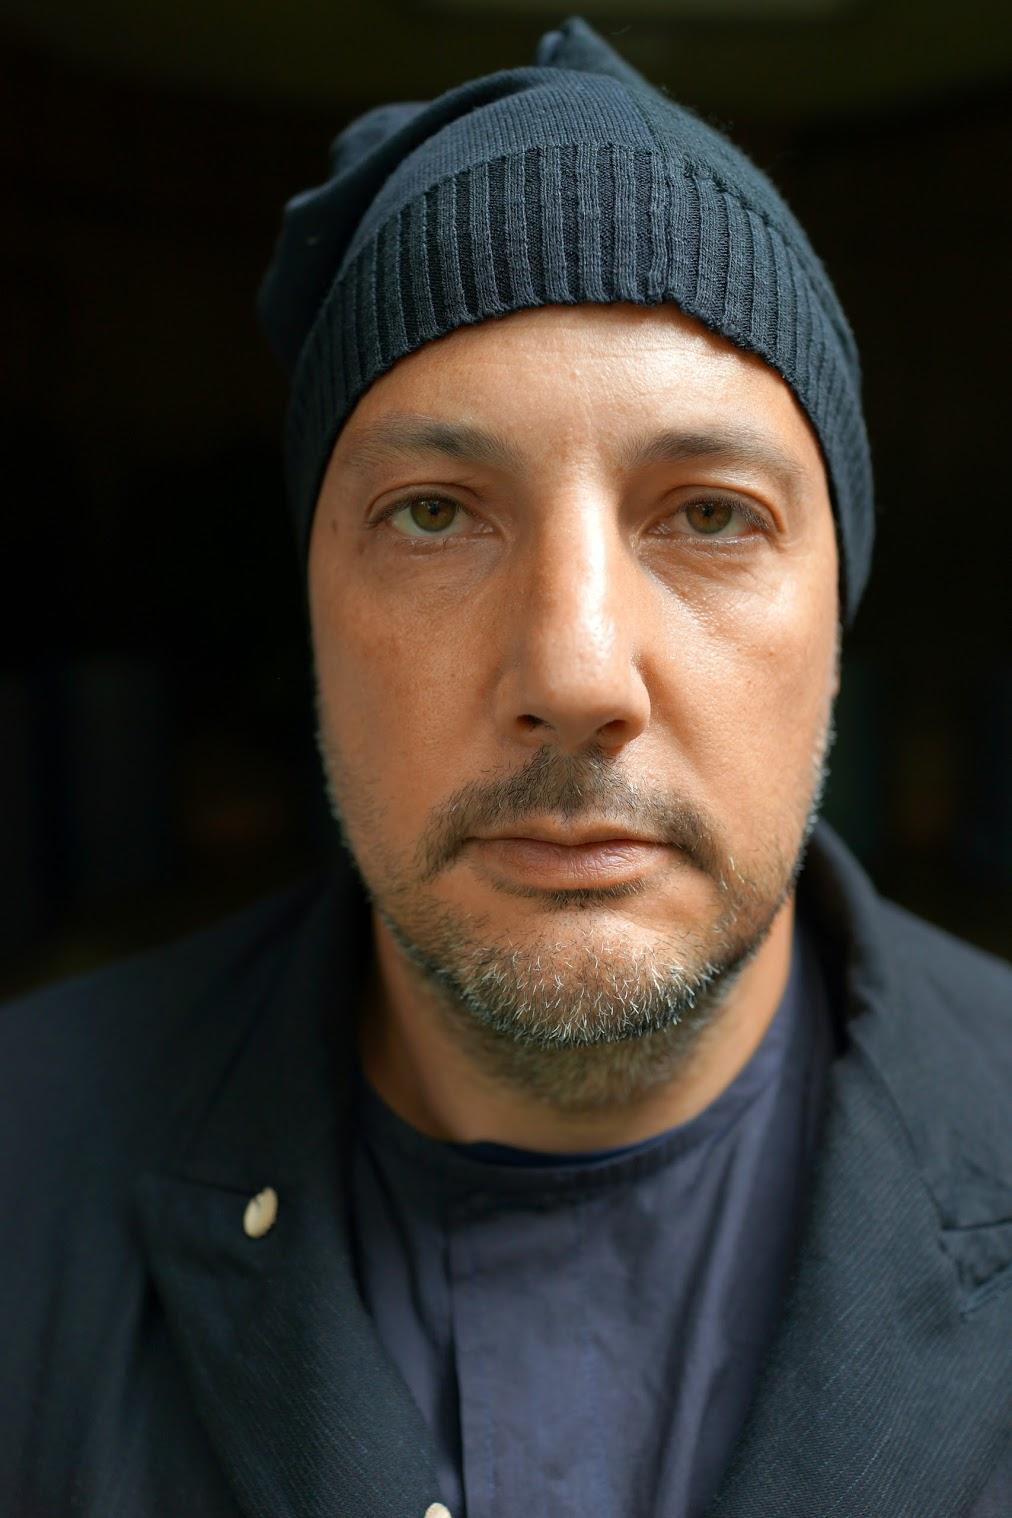 Stefan Simchowitz (photo courtesy Simchowitz's Google+ page)